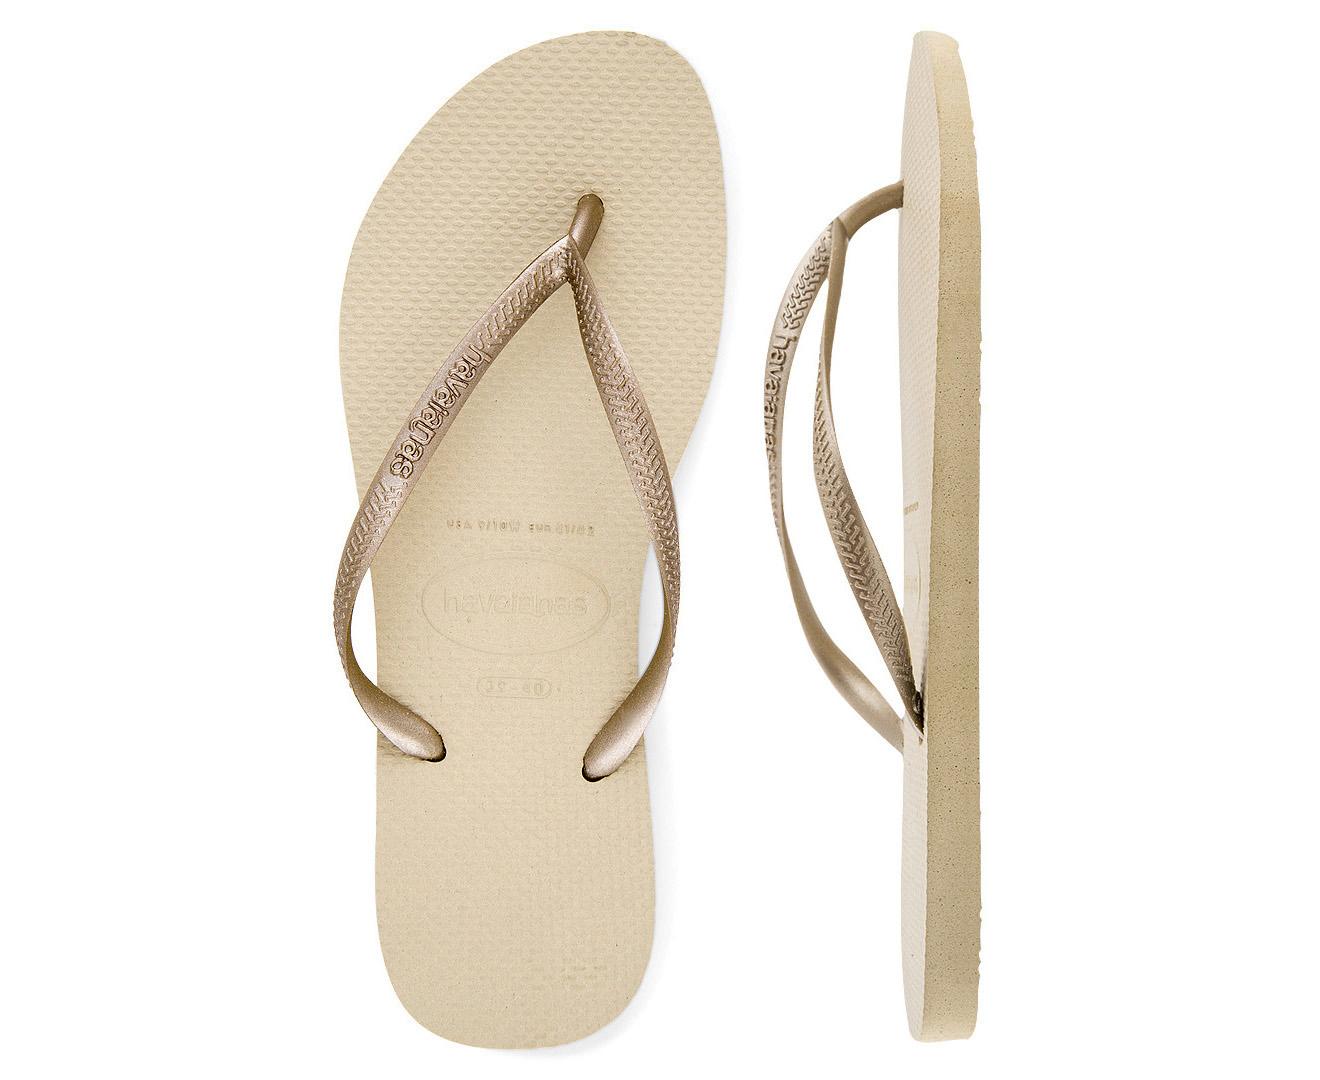 c66fd271e6e62 Havaianas Metallic Slim Thongs - Sand  Light Golden